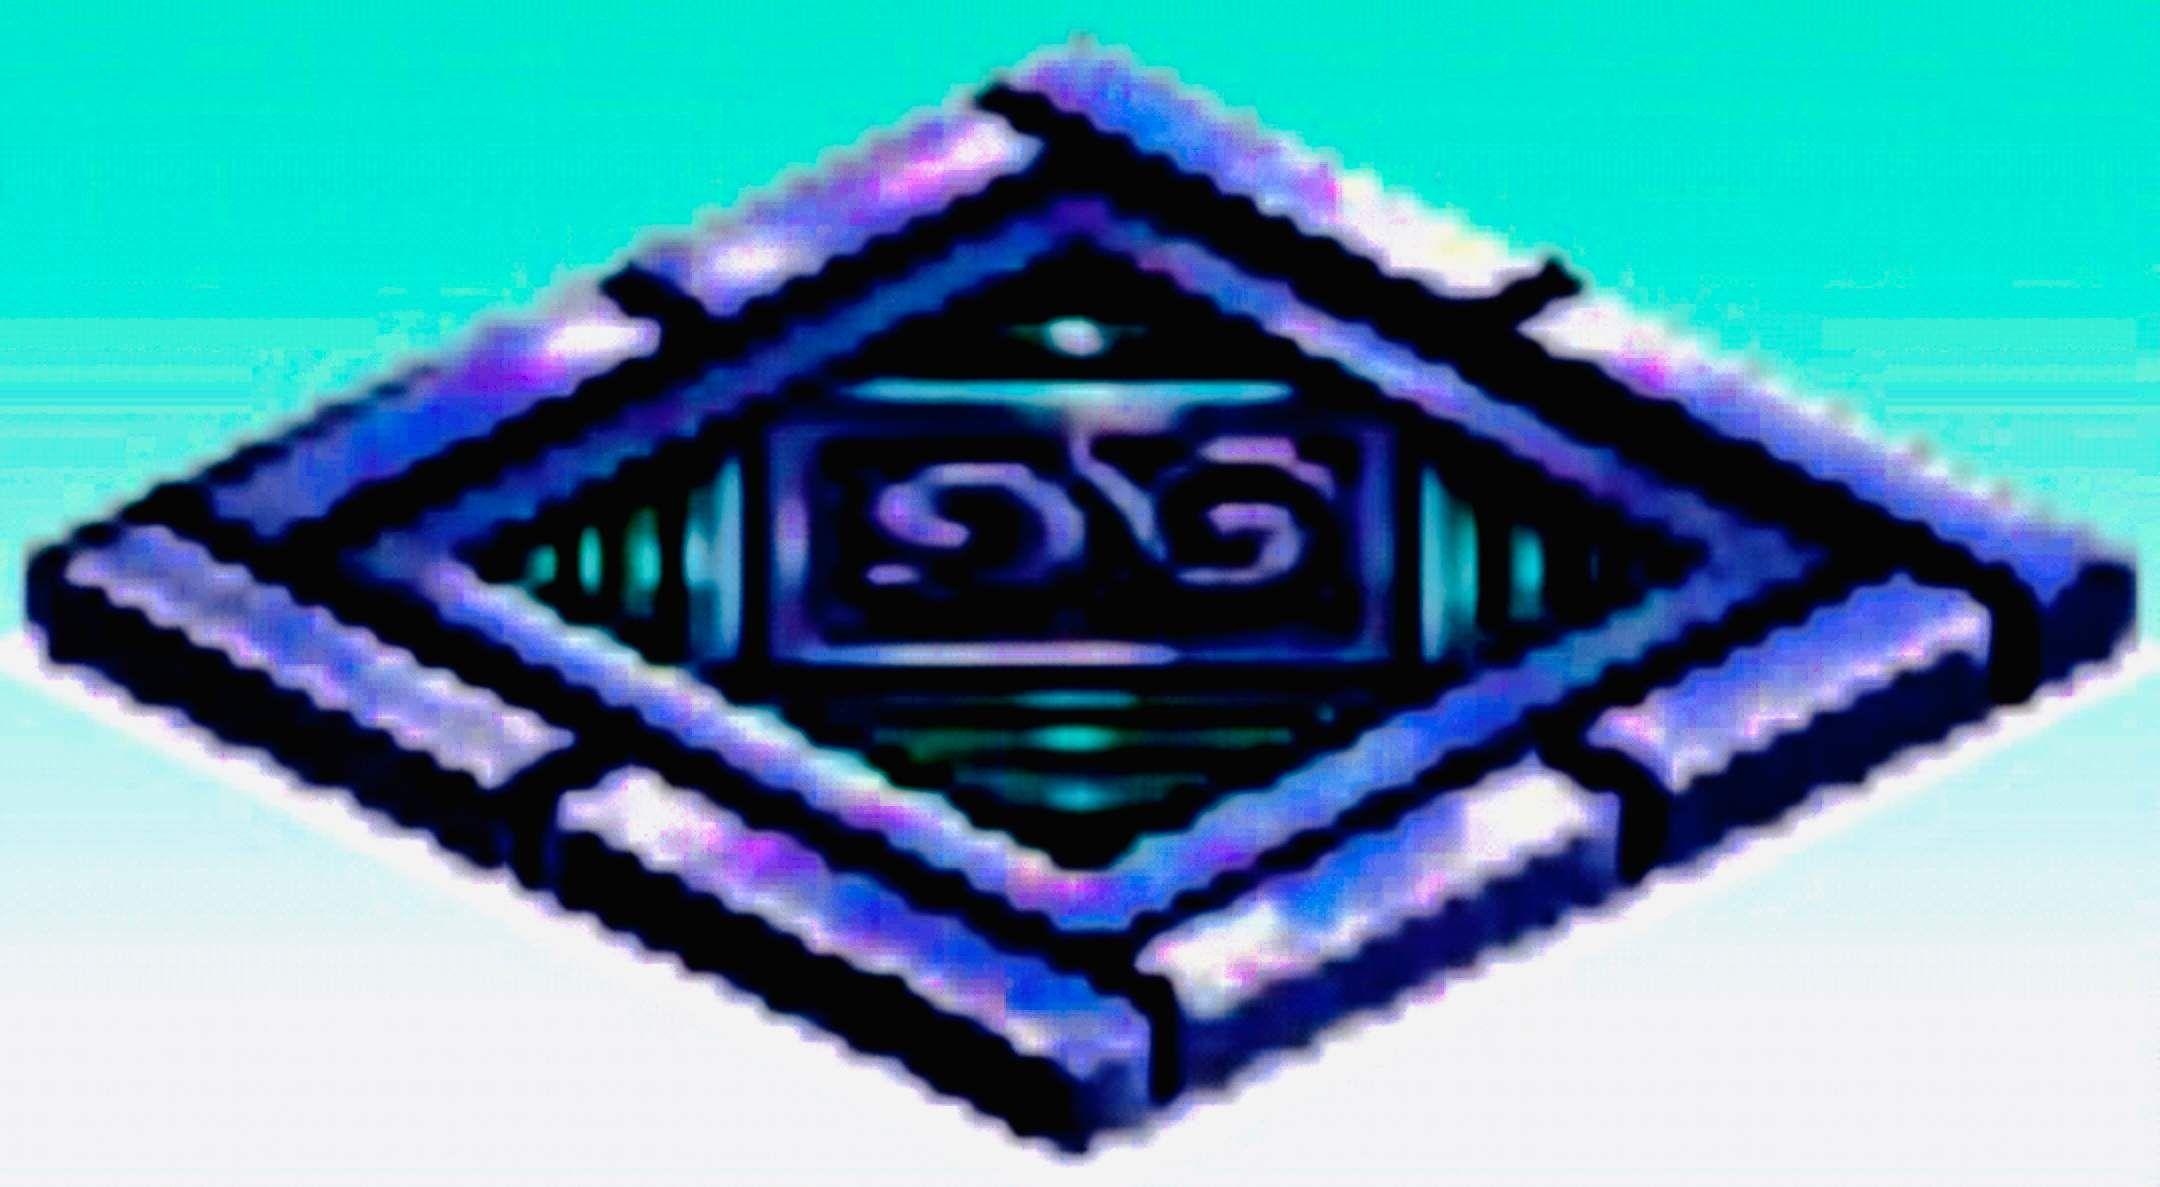 0_1599946034148_DBACB76B-E2B0-4429-8264-9238D5CA712E.jpeg